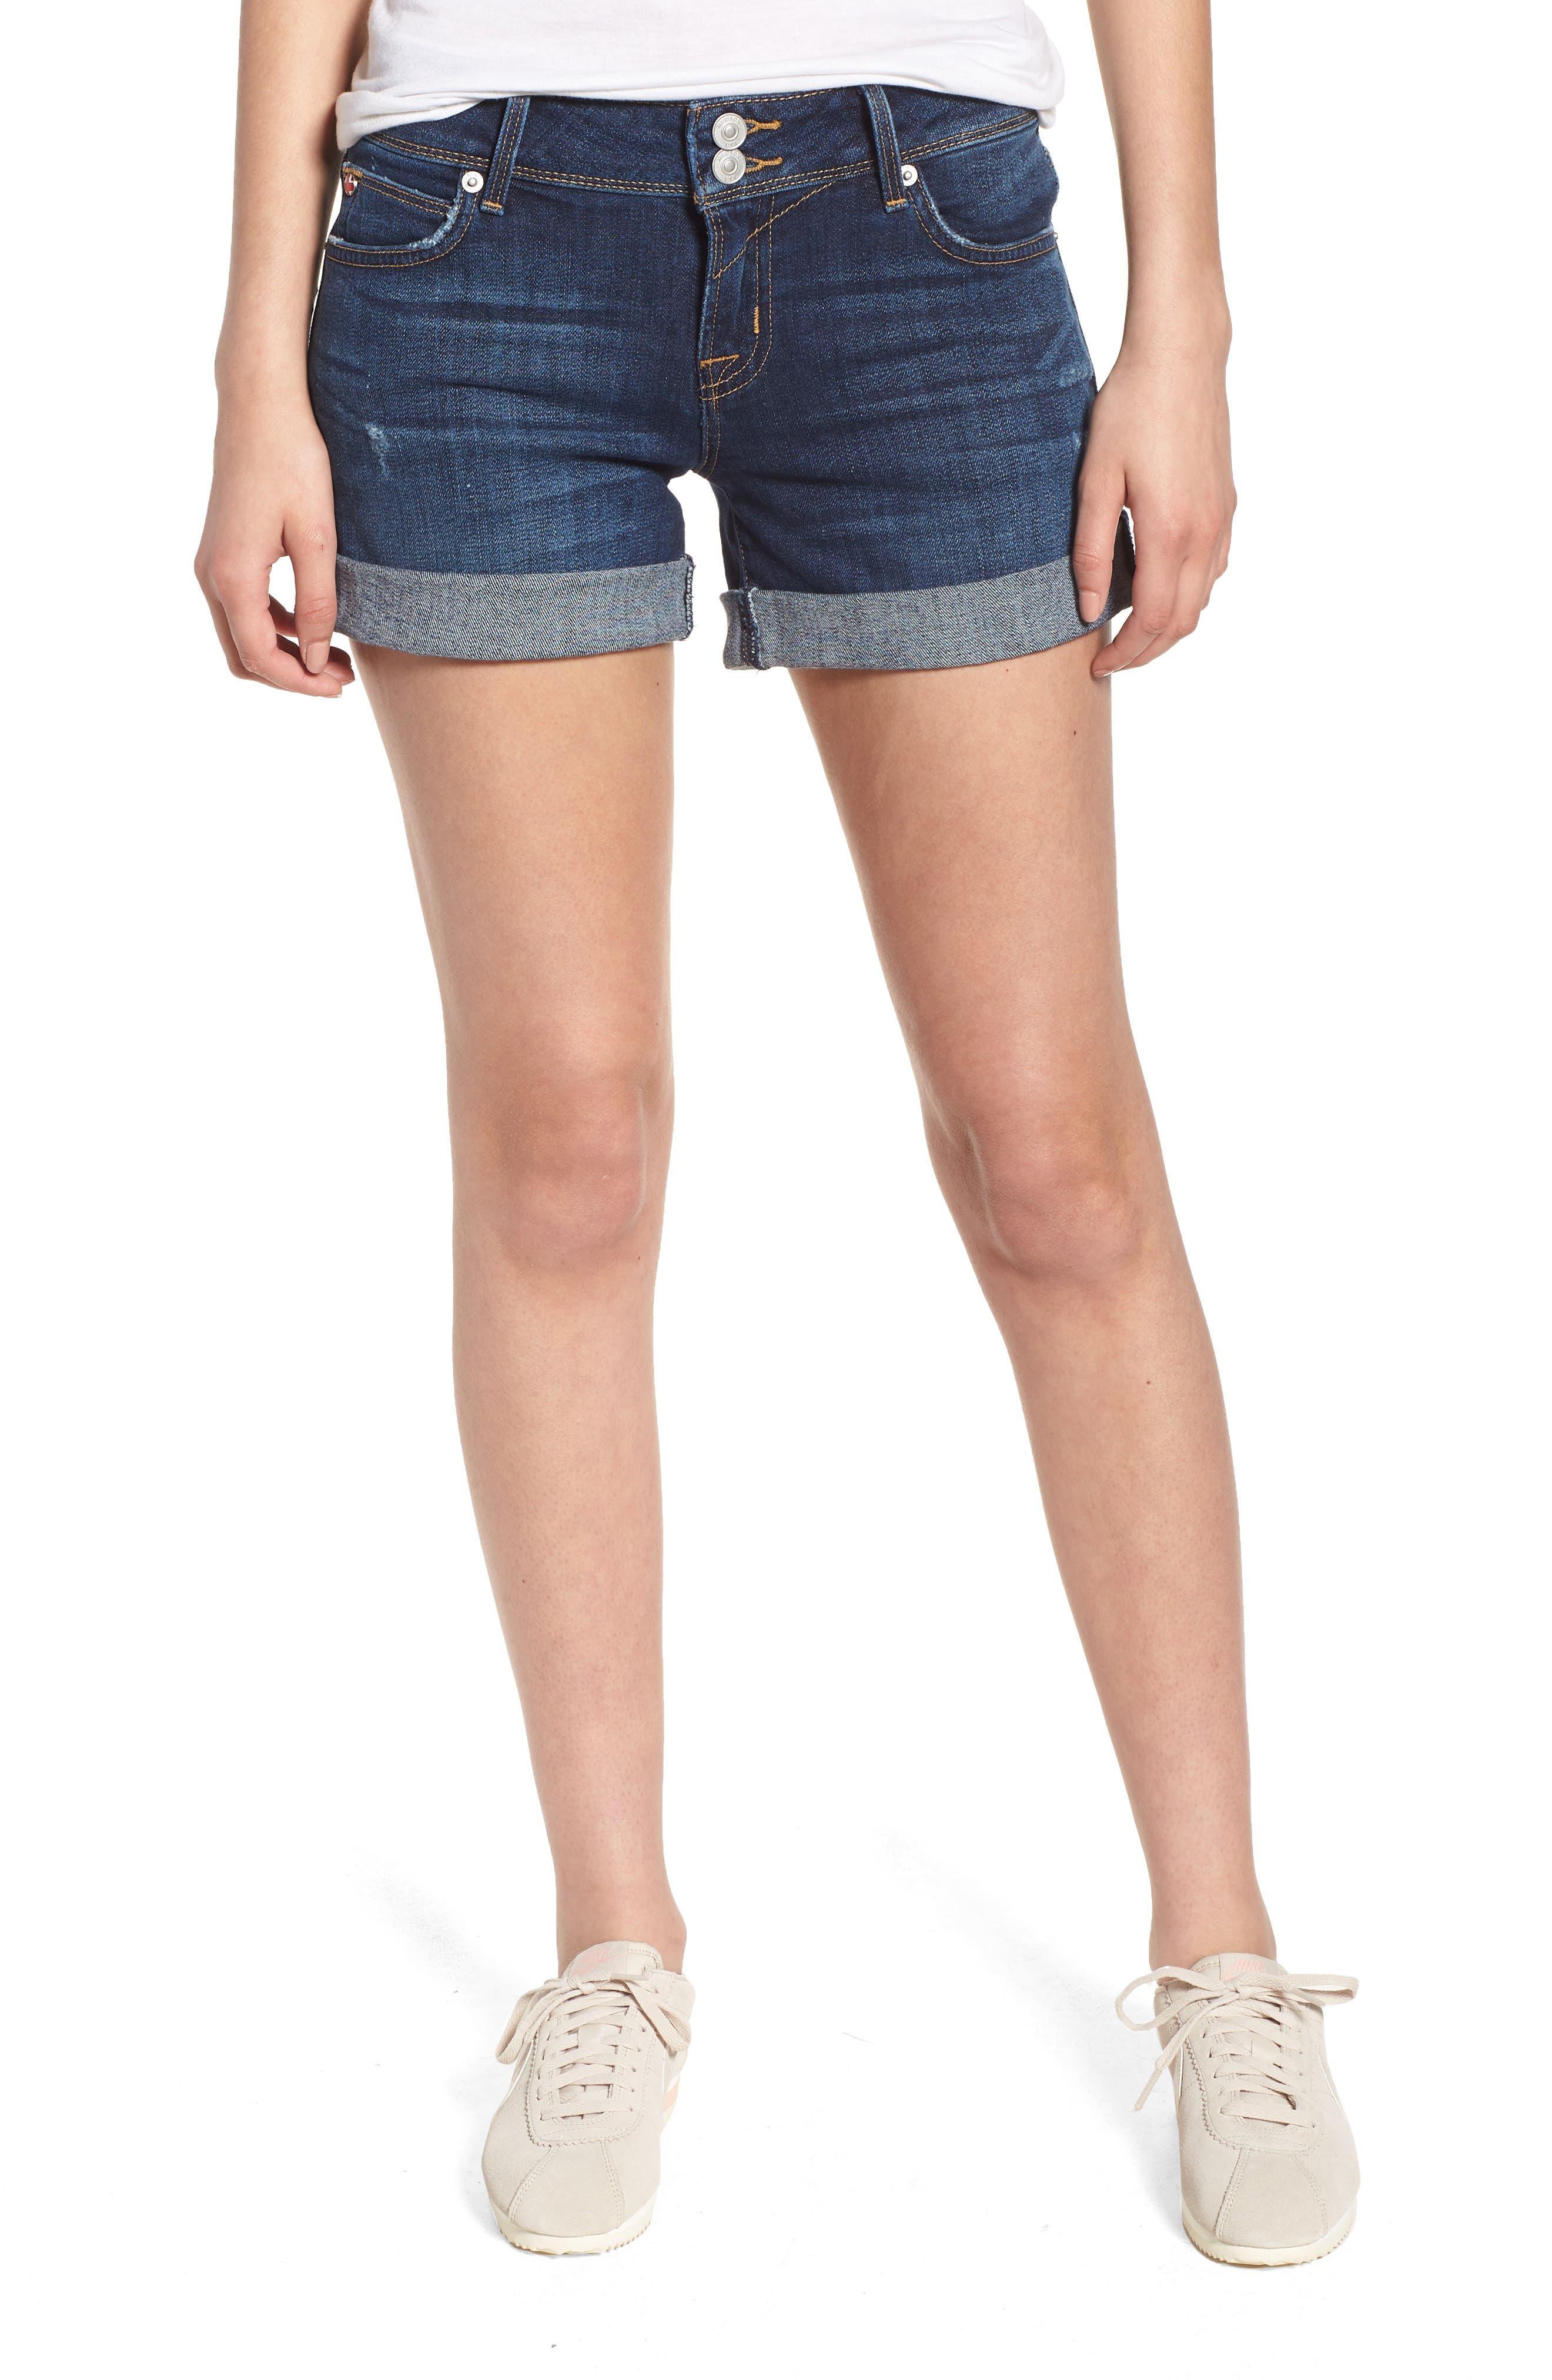 Croxley Cuffed Denim Shorts,                             Main thumbnail 1, color,                             423